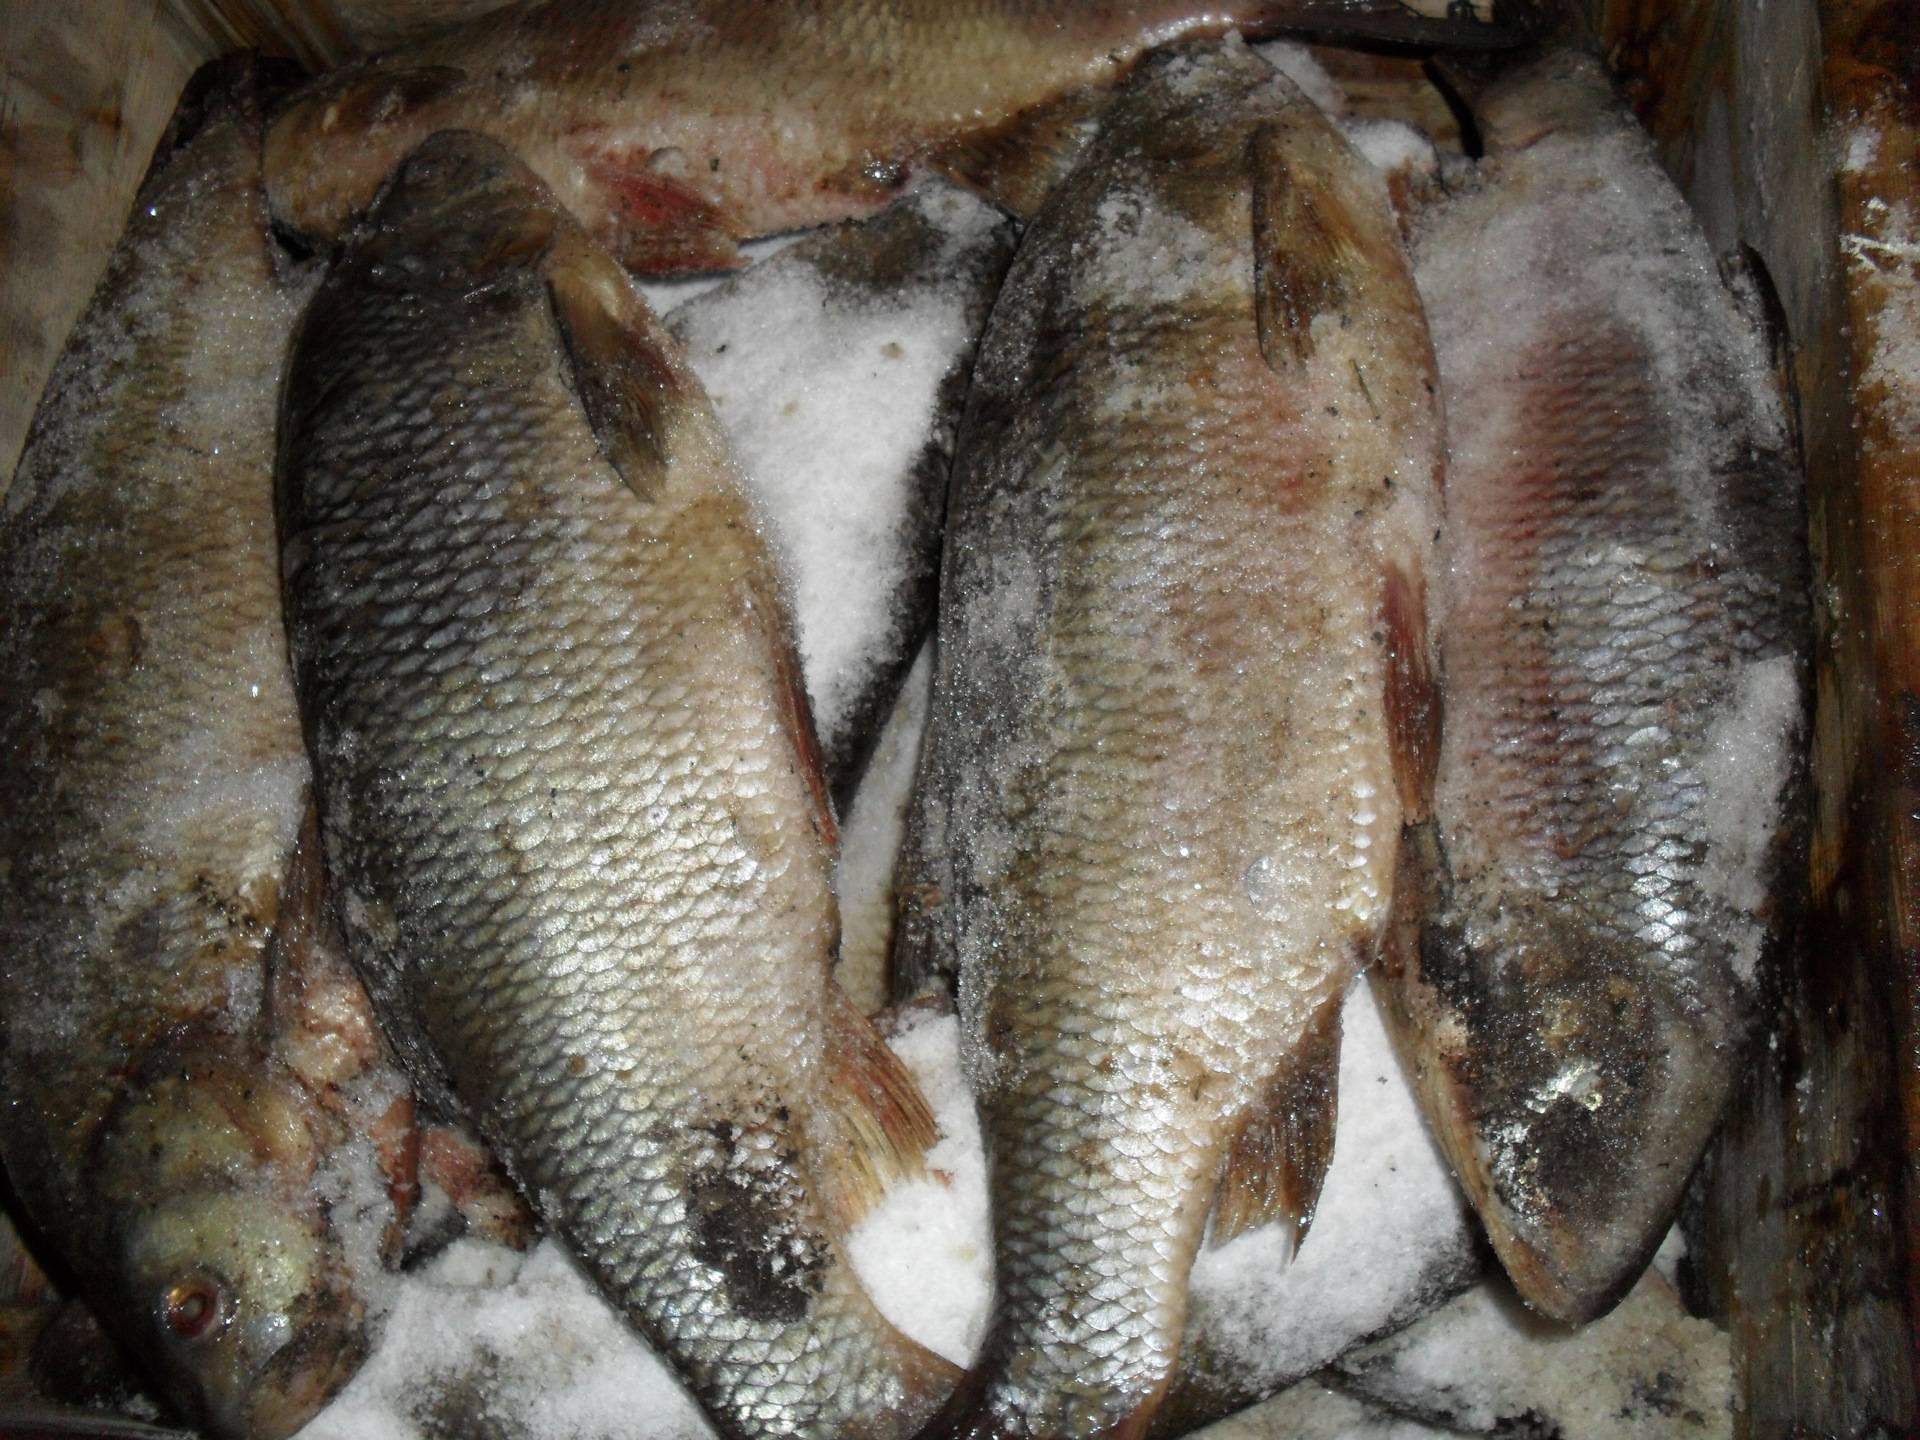 Таранка (таранька) / заготовка рыбы / tvcook: пошаговые рецепты с фото